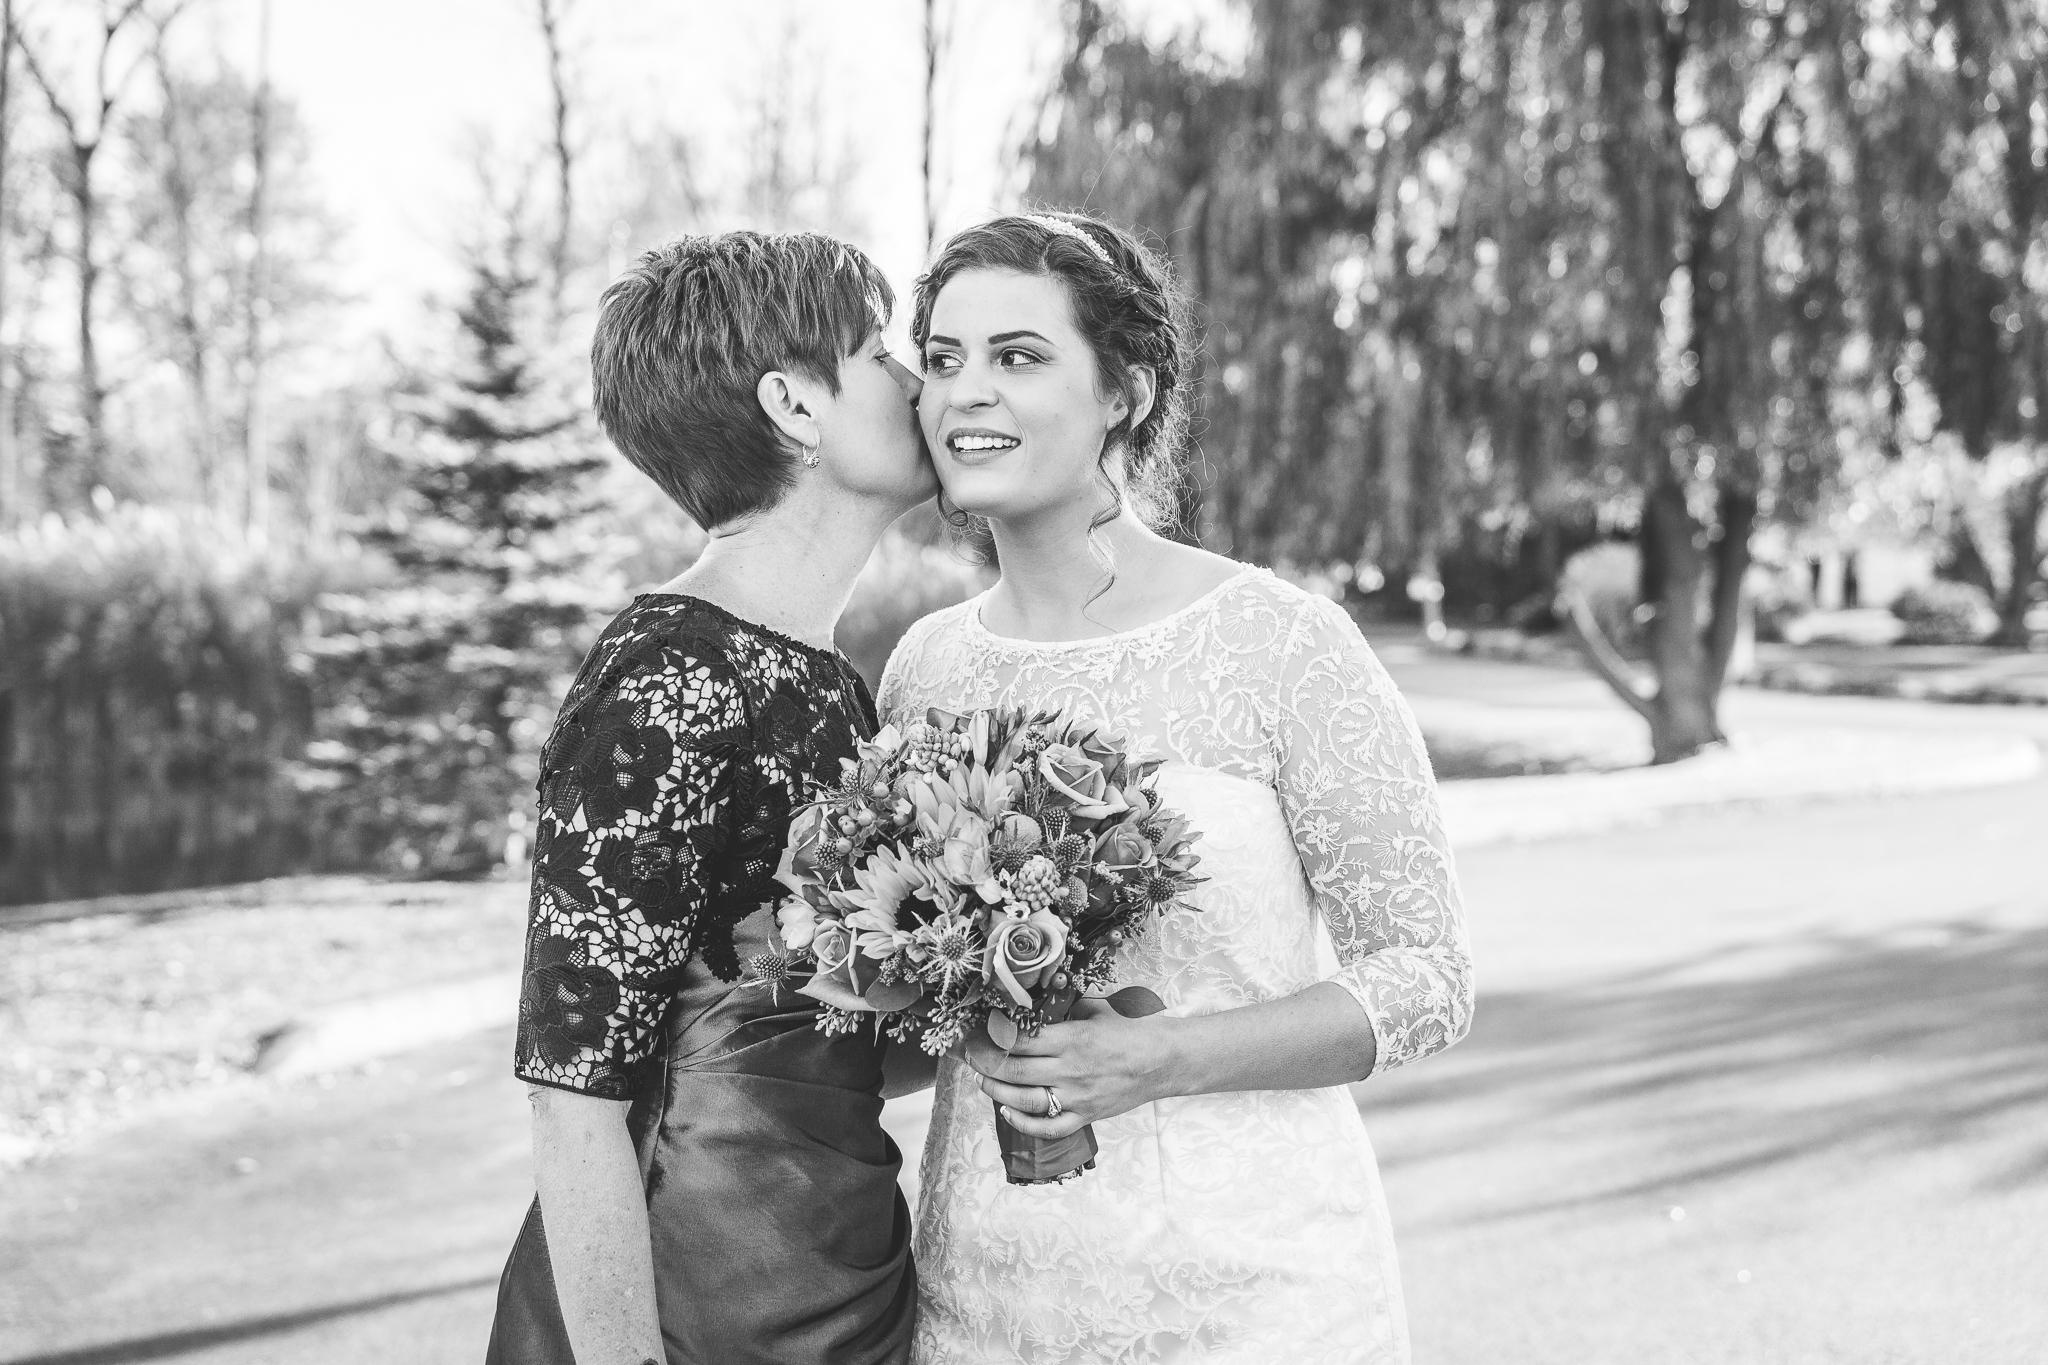 camuglia-whomstudio-chelsea_and_andy-nycphotographer-wedding-brooklyn-buffalo-timberlodge-036-0216.jpg